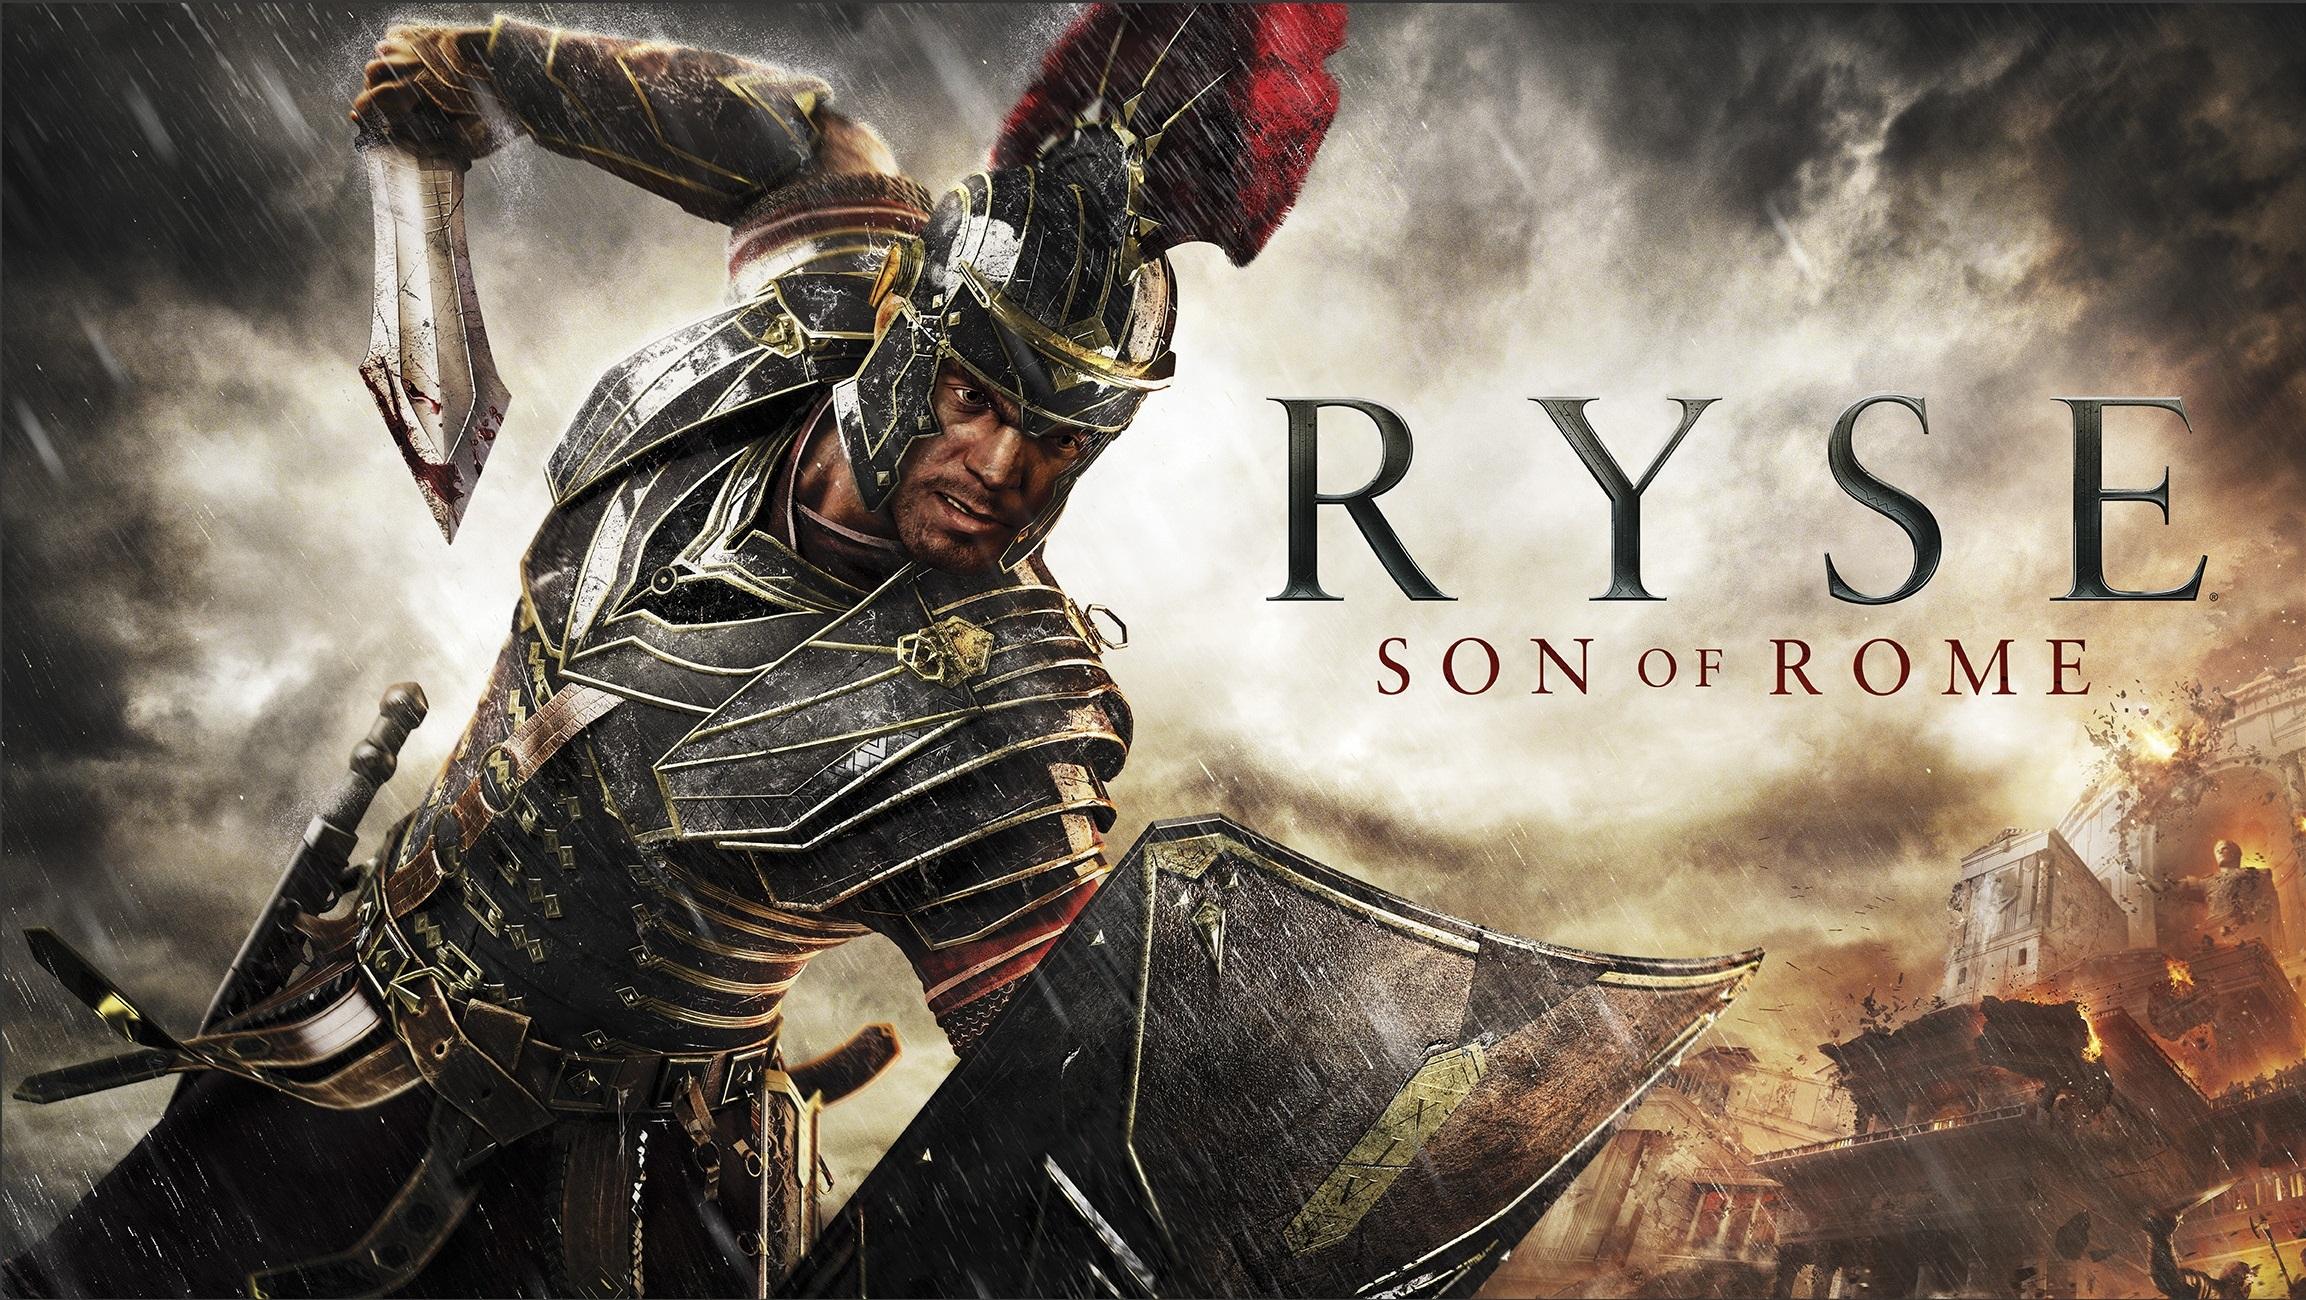 Ryse Son of Rome wallpaper 1